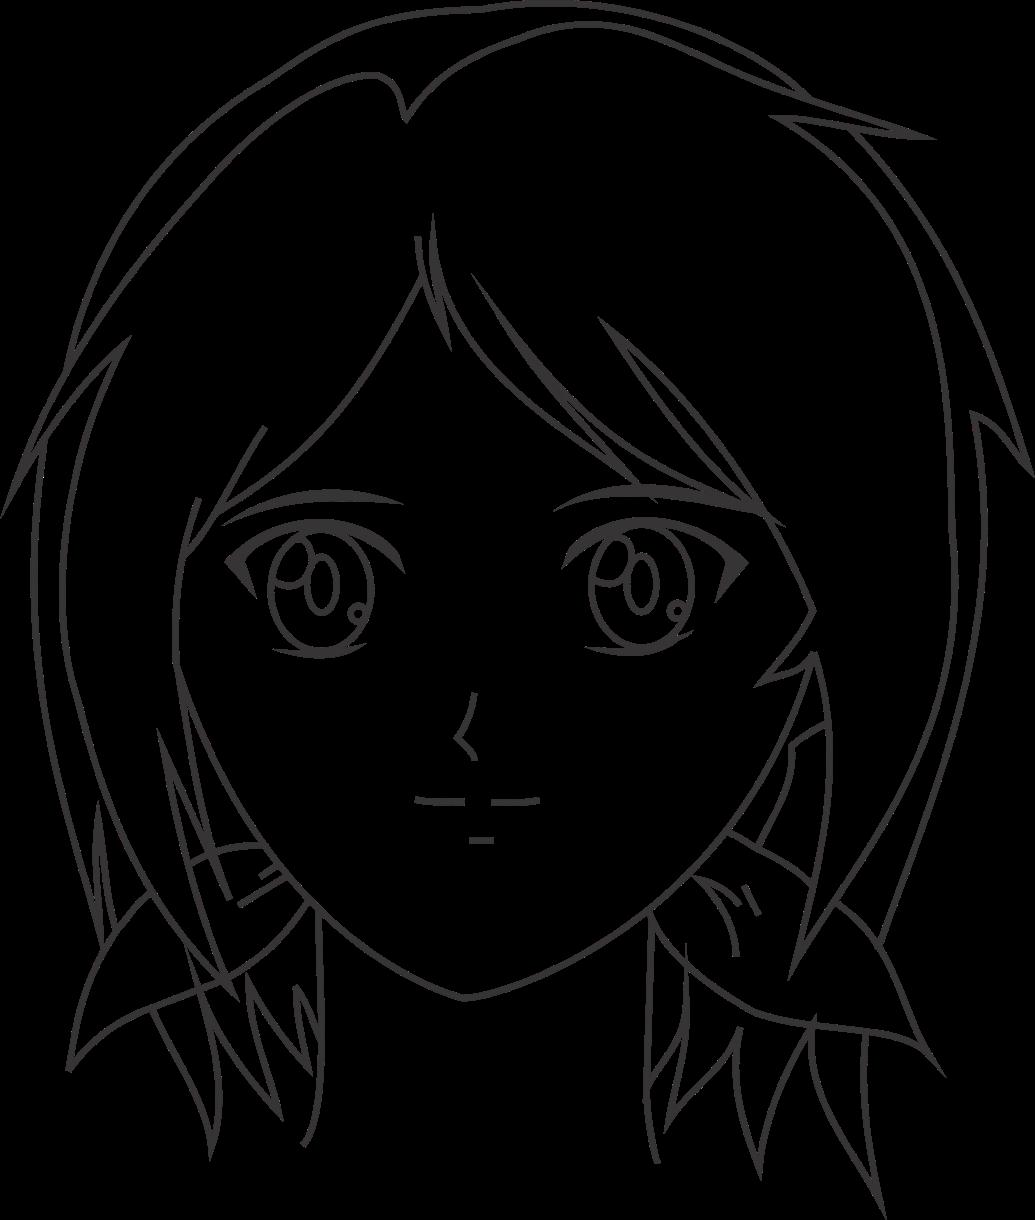 Cara Menggambar Anime Dengan Mudah Untuk Kamu Yang Masih Pemula Alabn Di 2020 Gambar Sketsa Gambar Ilusi Optik